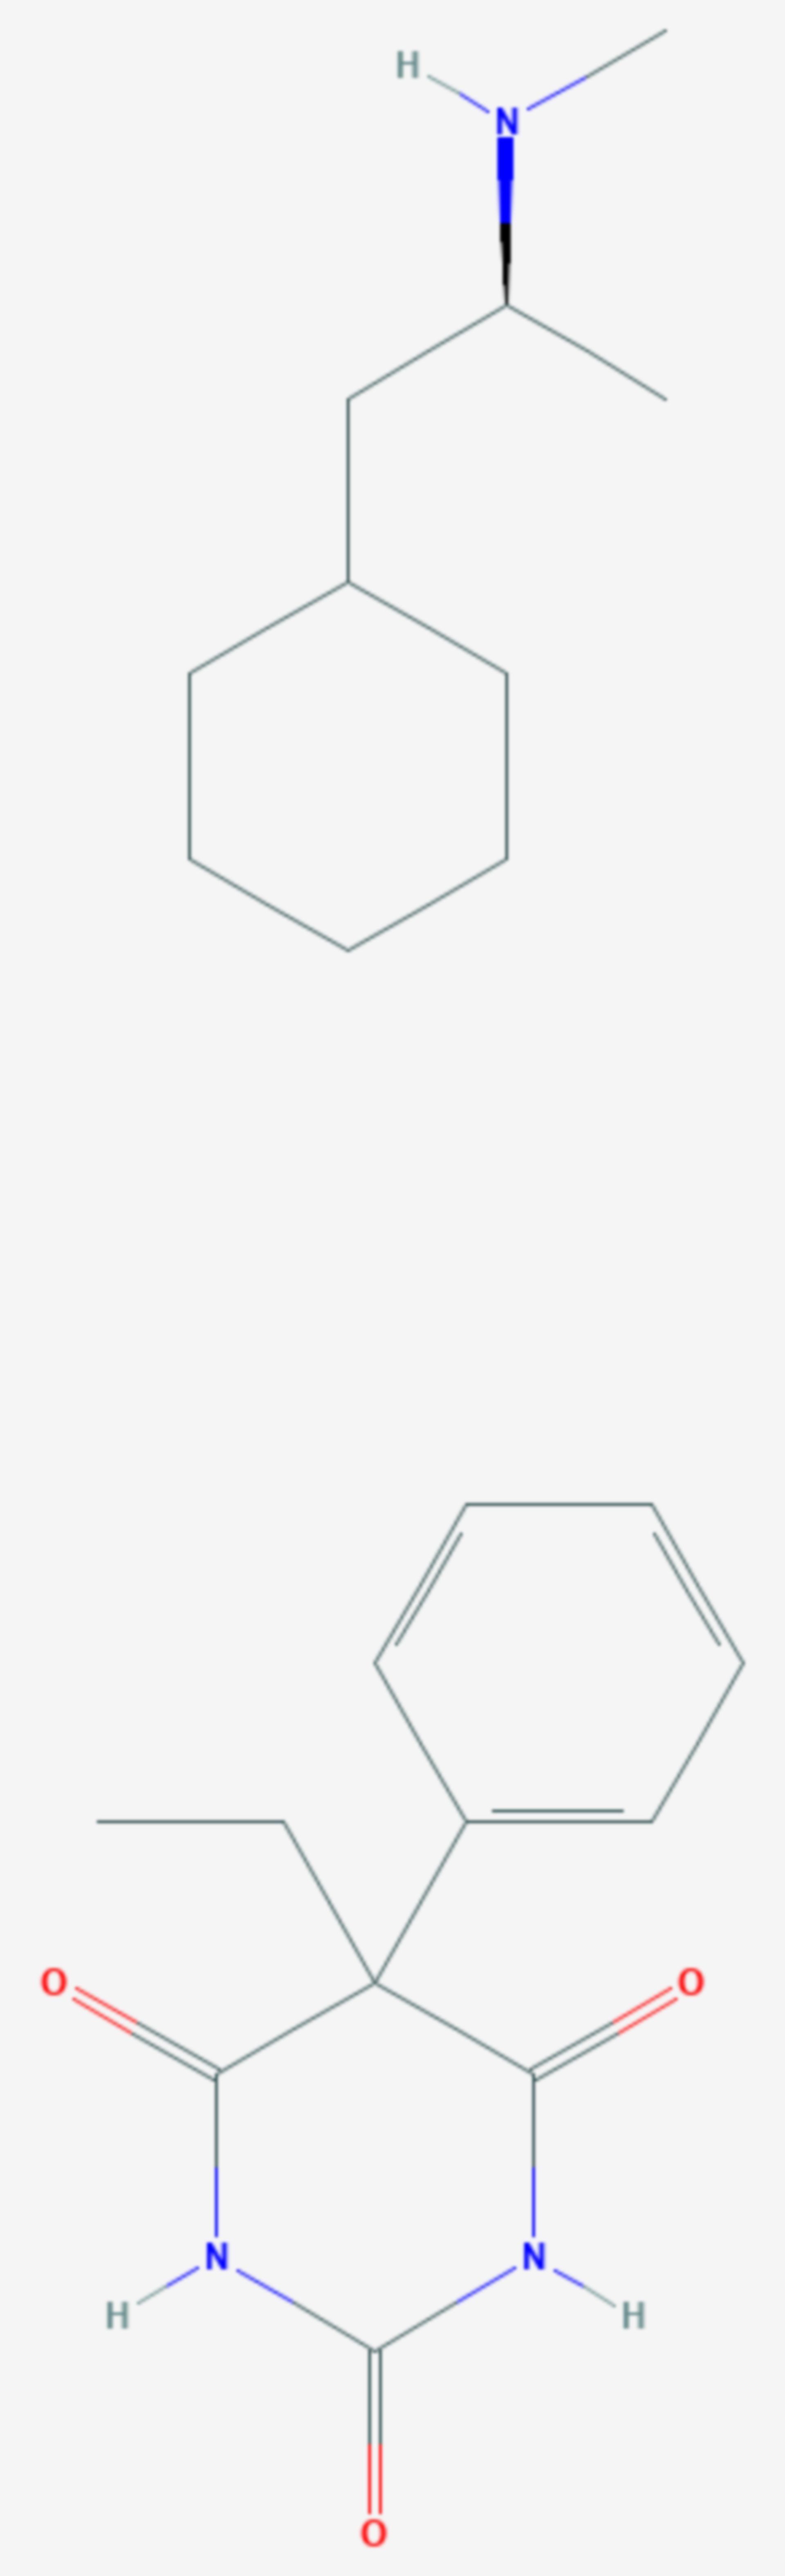 Barbexaclon (Strukturformel)